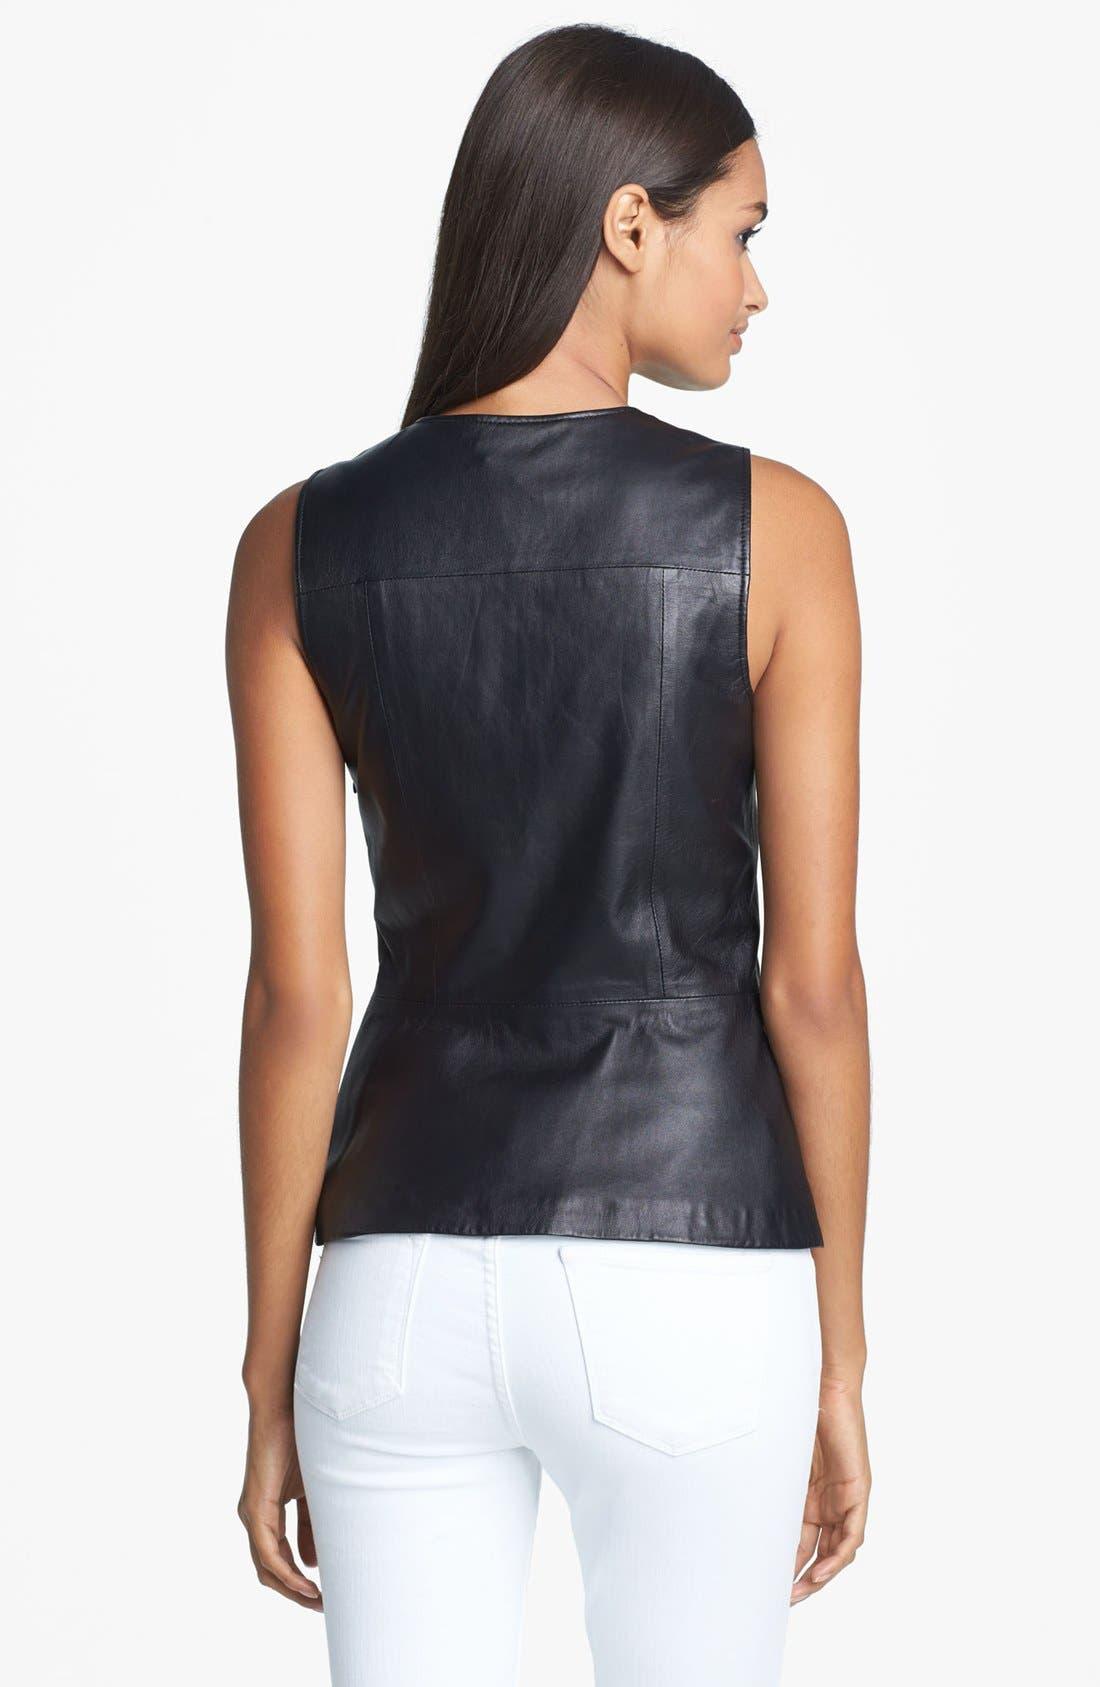 'Etia L.' Leather Top,                             Alternate thumbnail 3, color,                             001